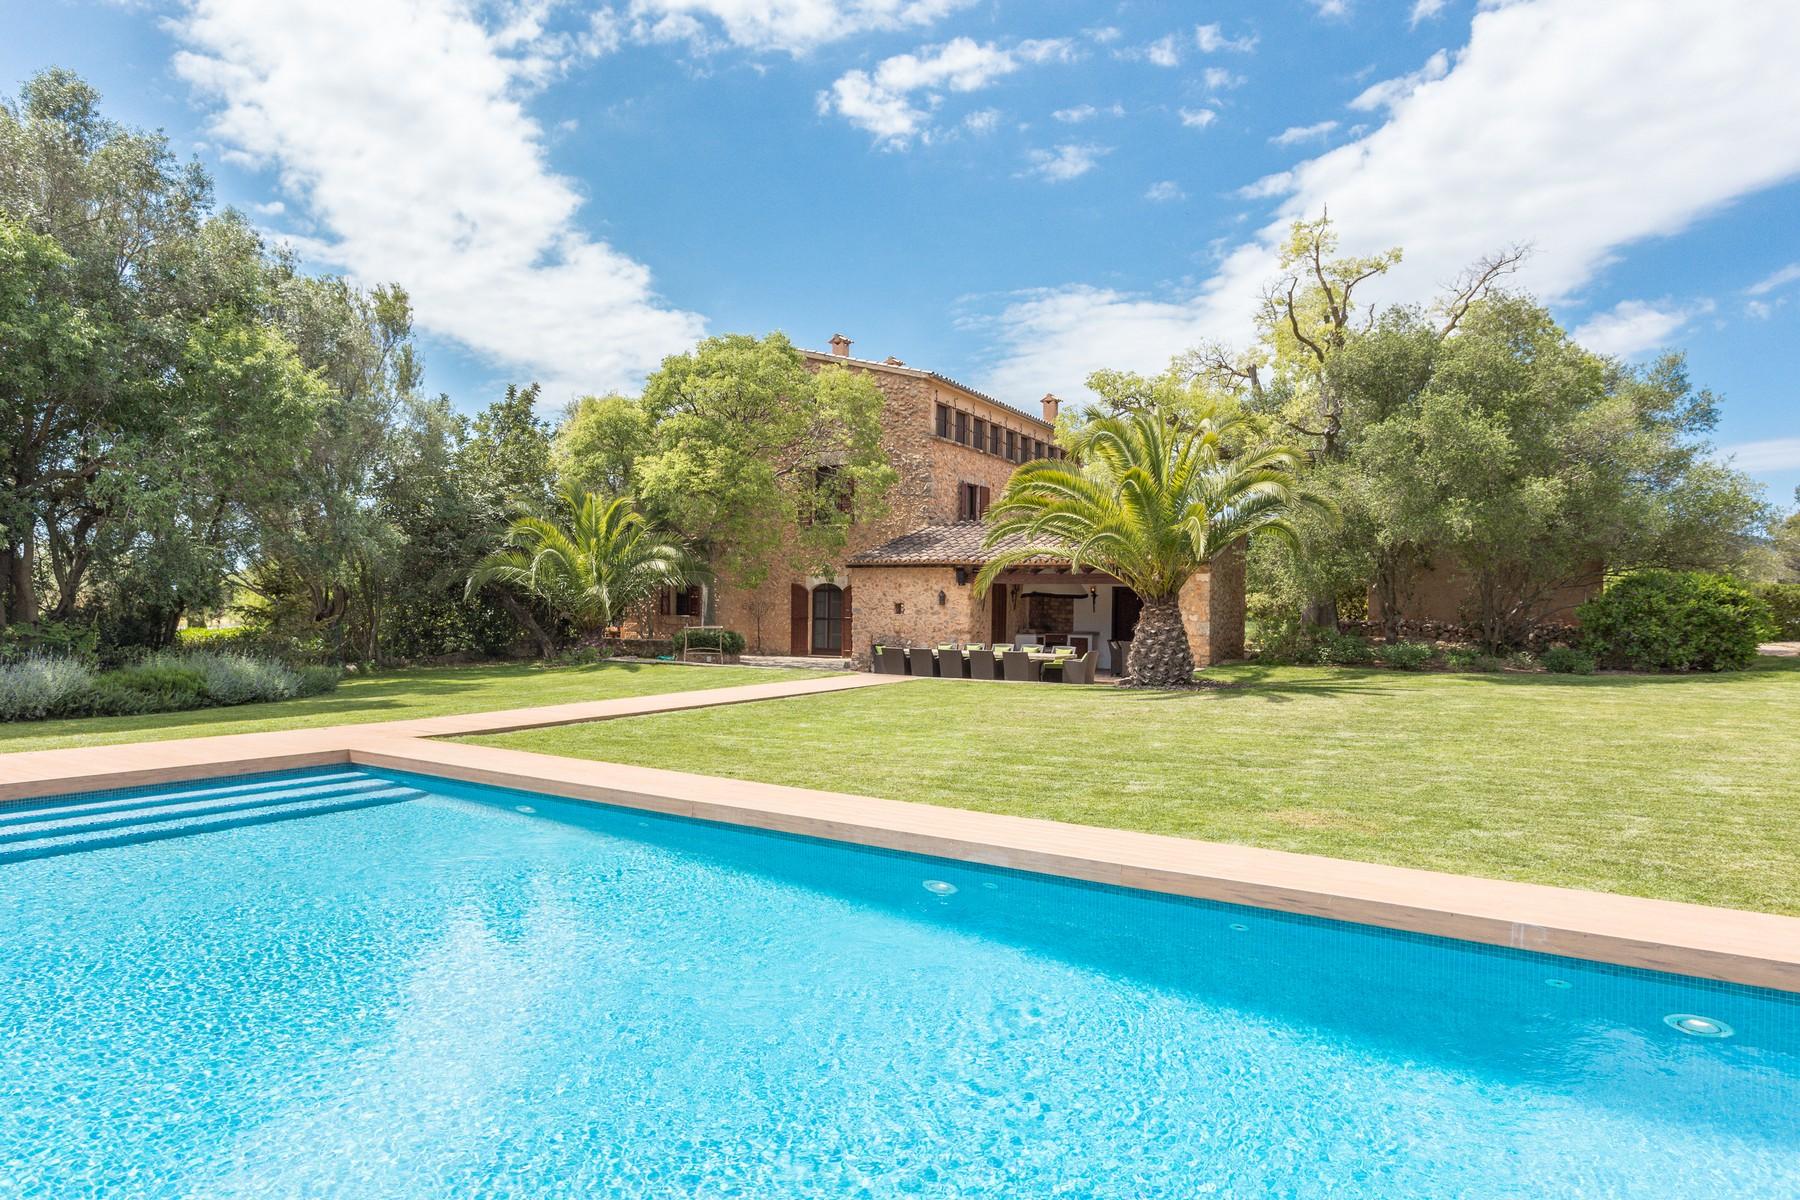 Maison unifamiliale pour l Vente à Historic country house in Santa Maria Santa Maria, Majorque, 07320 Espagne